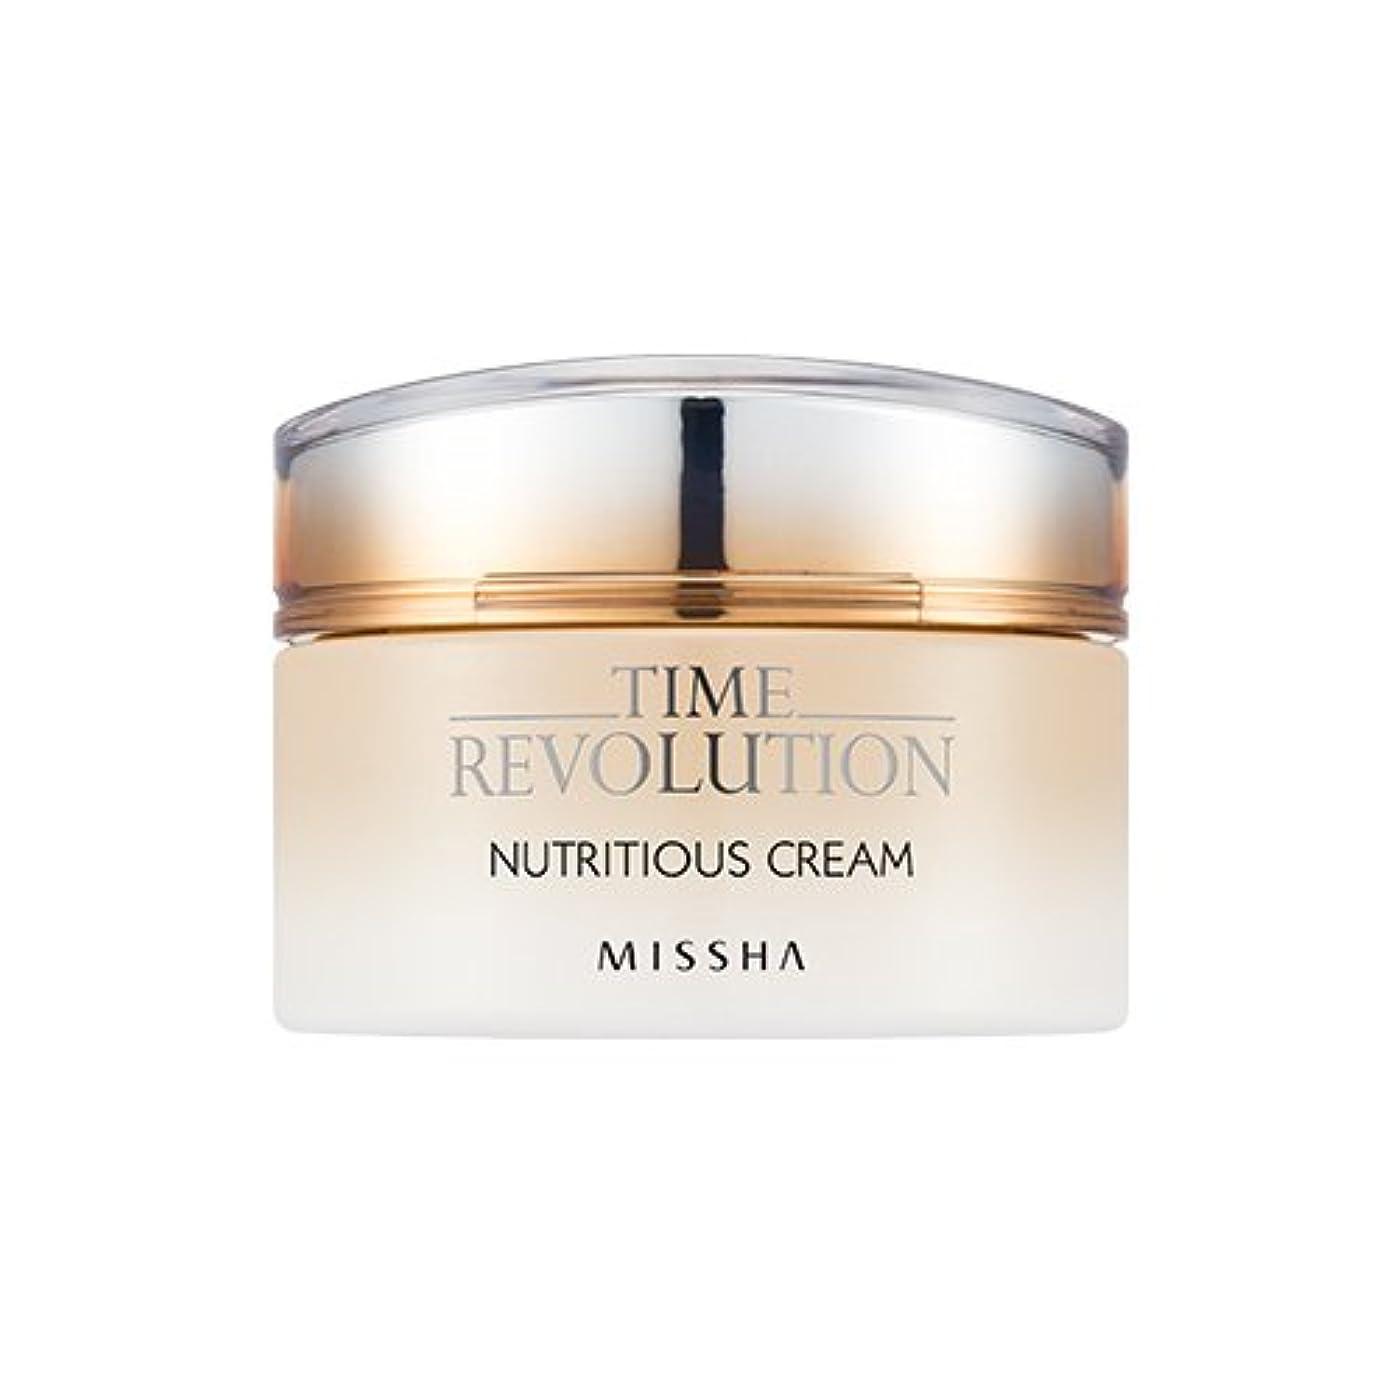 [New] MISSHA Time Revolution Nutritious Cream 50ml/ミシャ タイム レボリューション ニュートリシャス クリーム 50ml [並行輸入品]